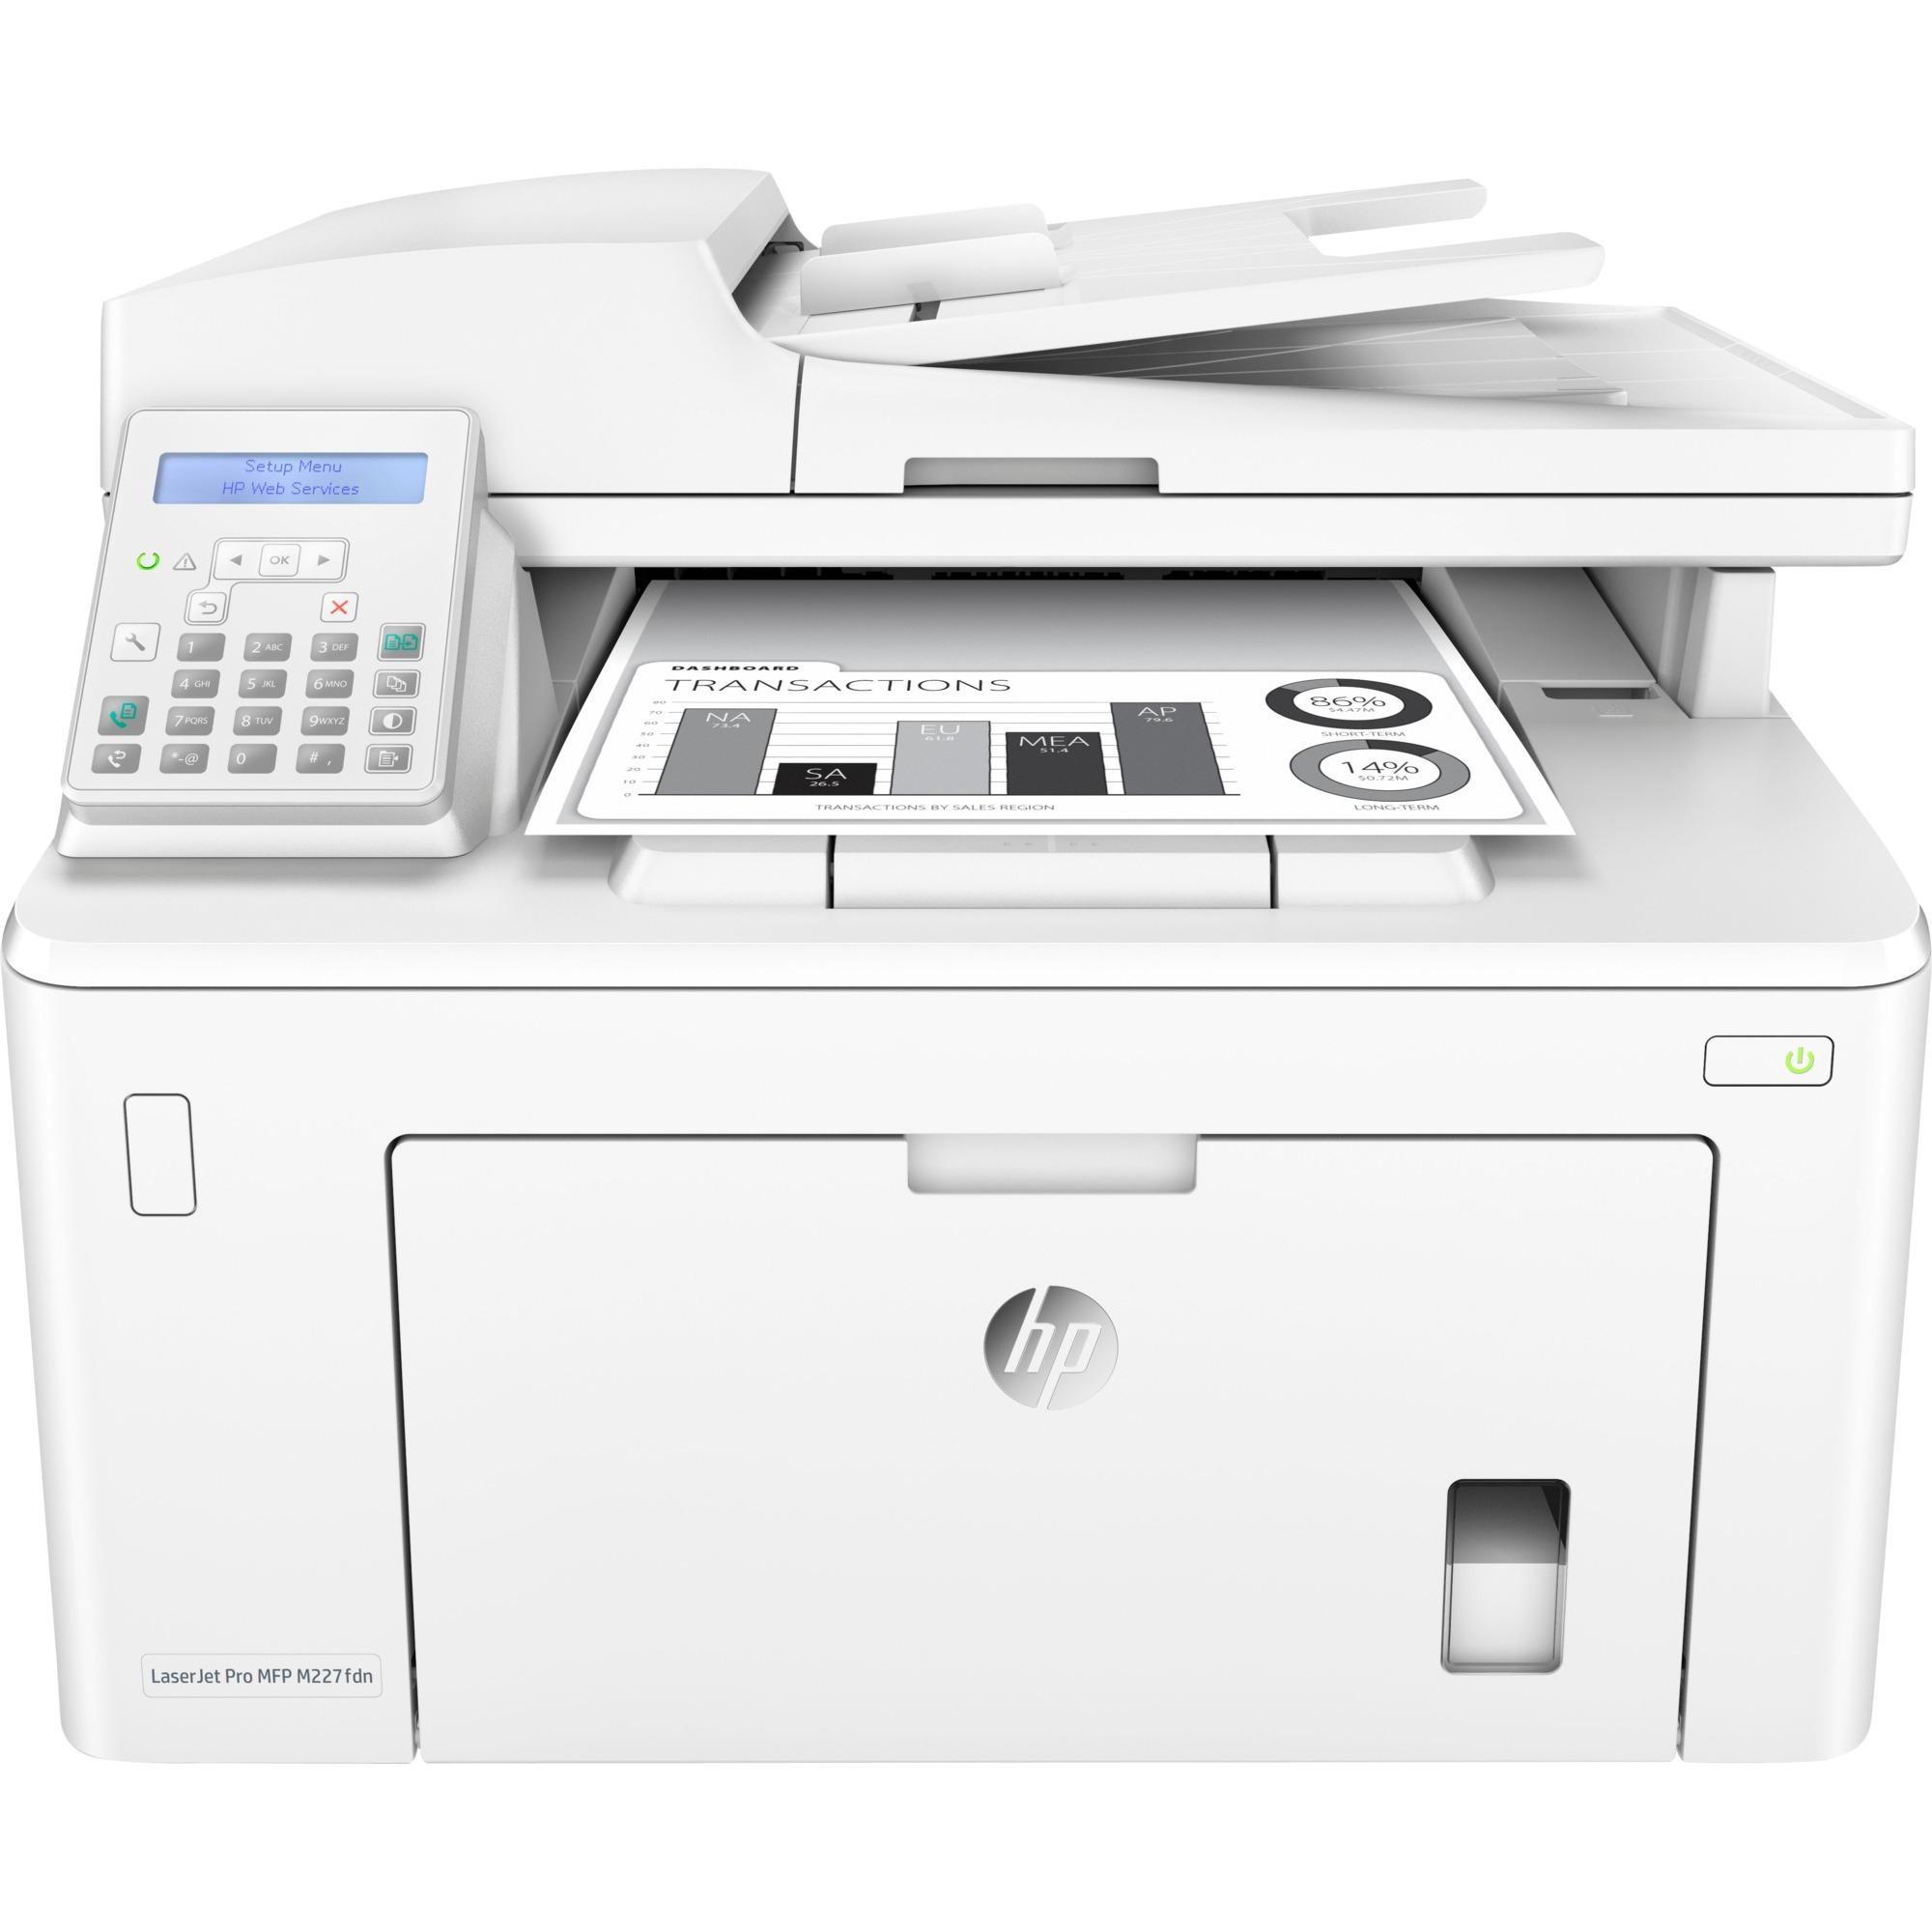 LaserJet Pro M227fdn Laser 30 ppm 1200 x 1200 DPI A4, Impresora multifuncional